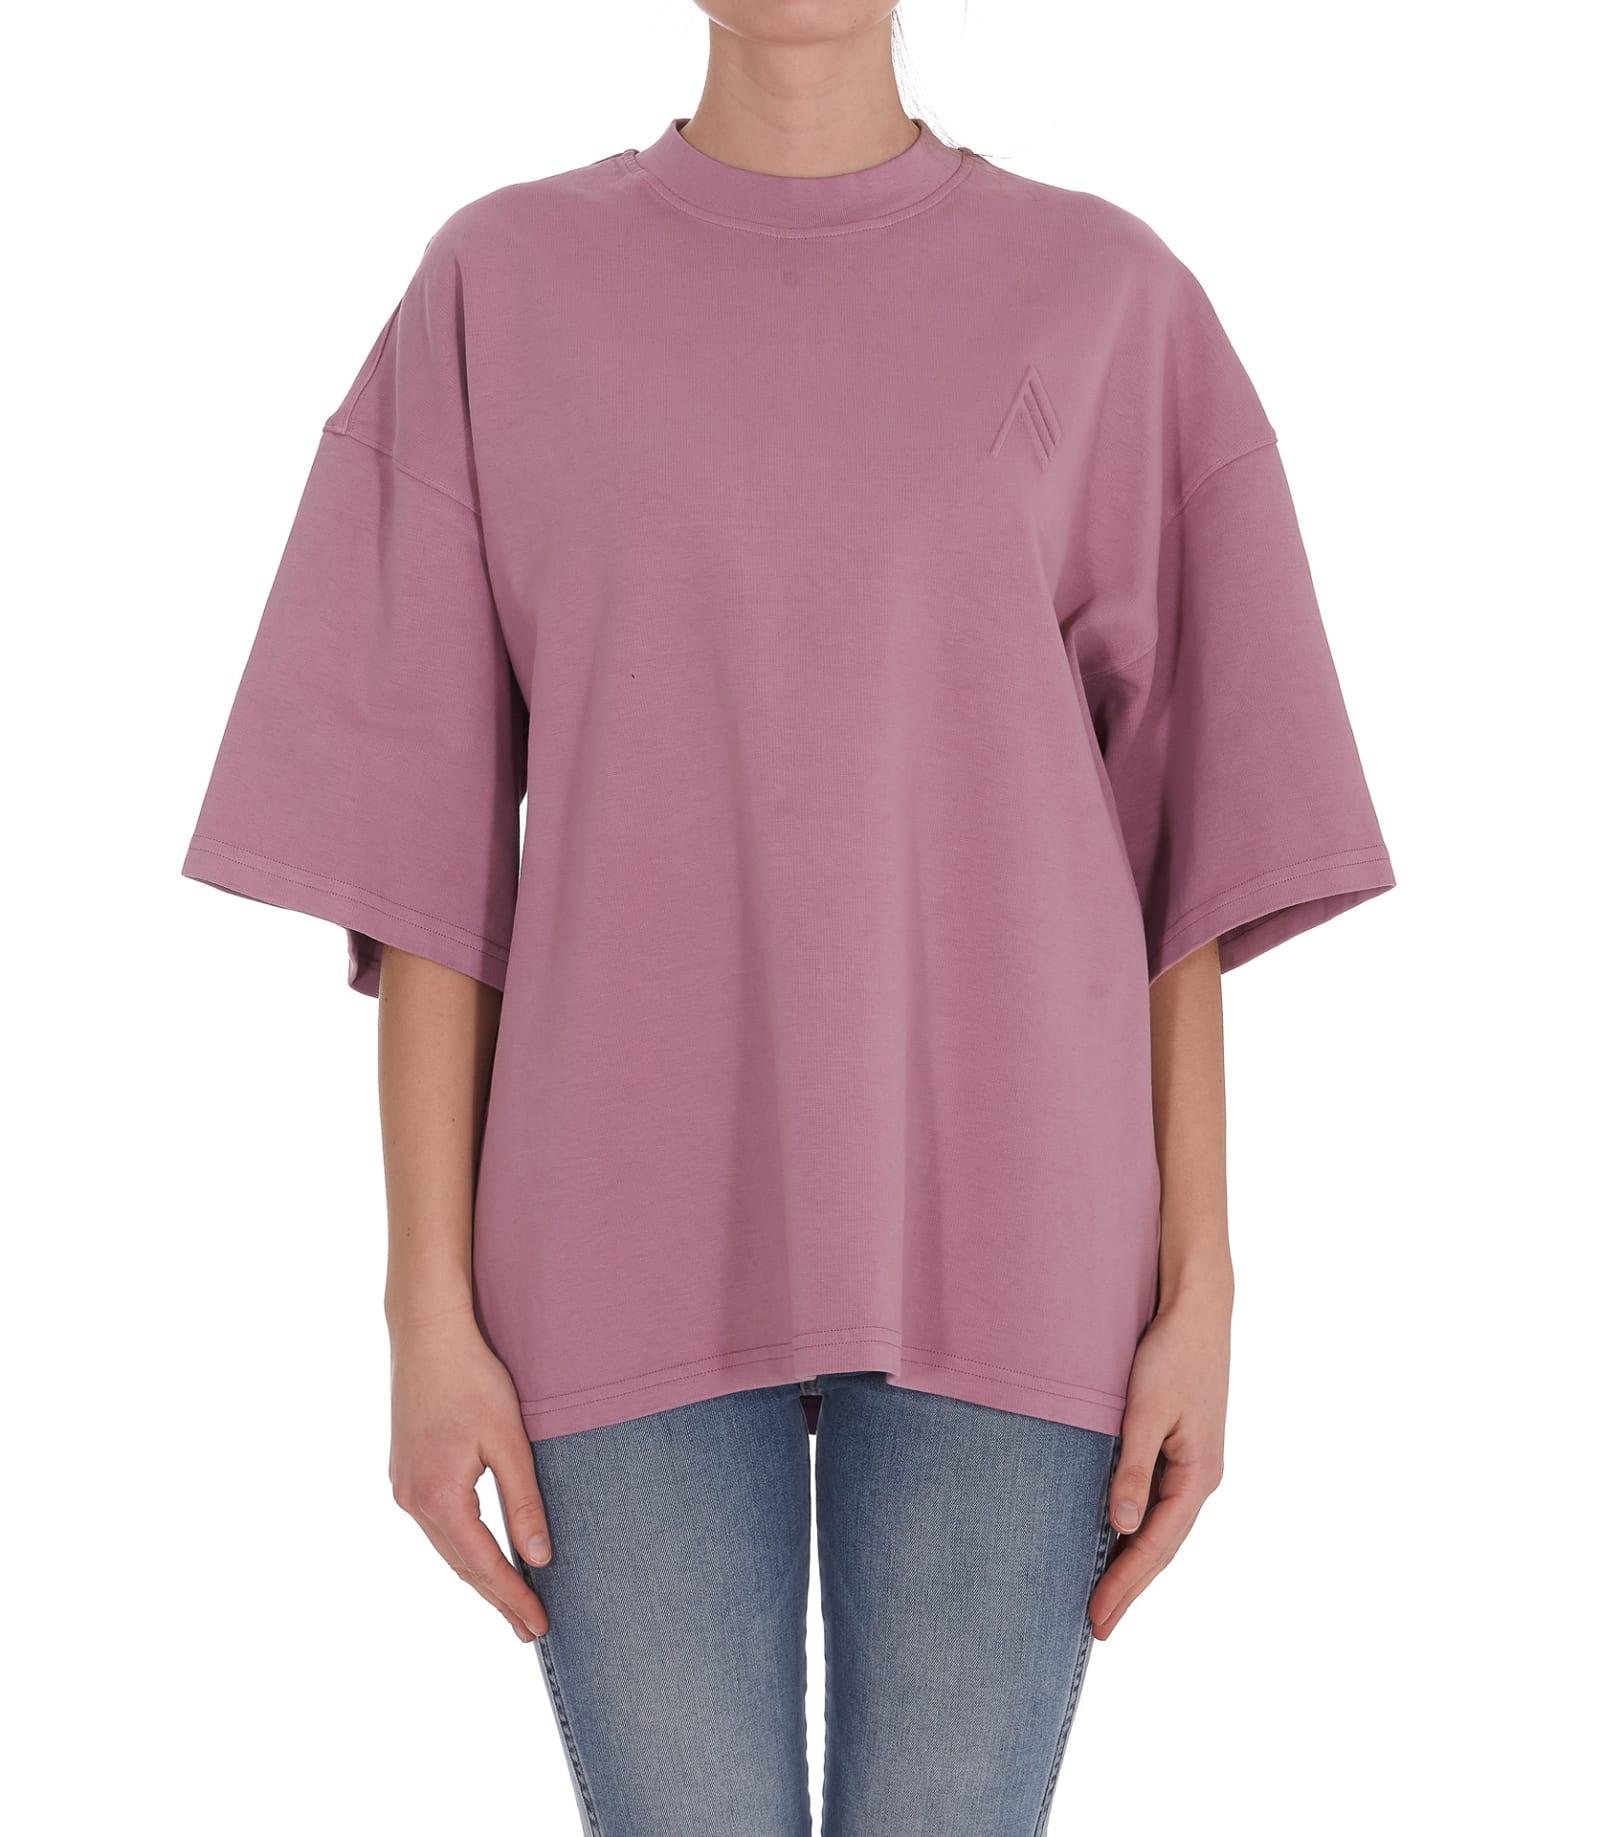 Attico T-shirts CARA T-SHIRT